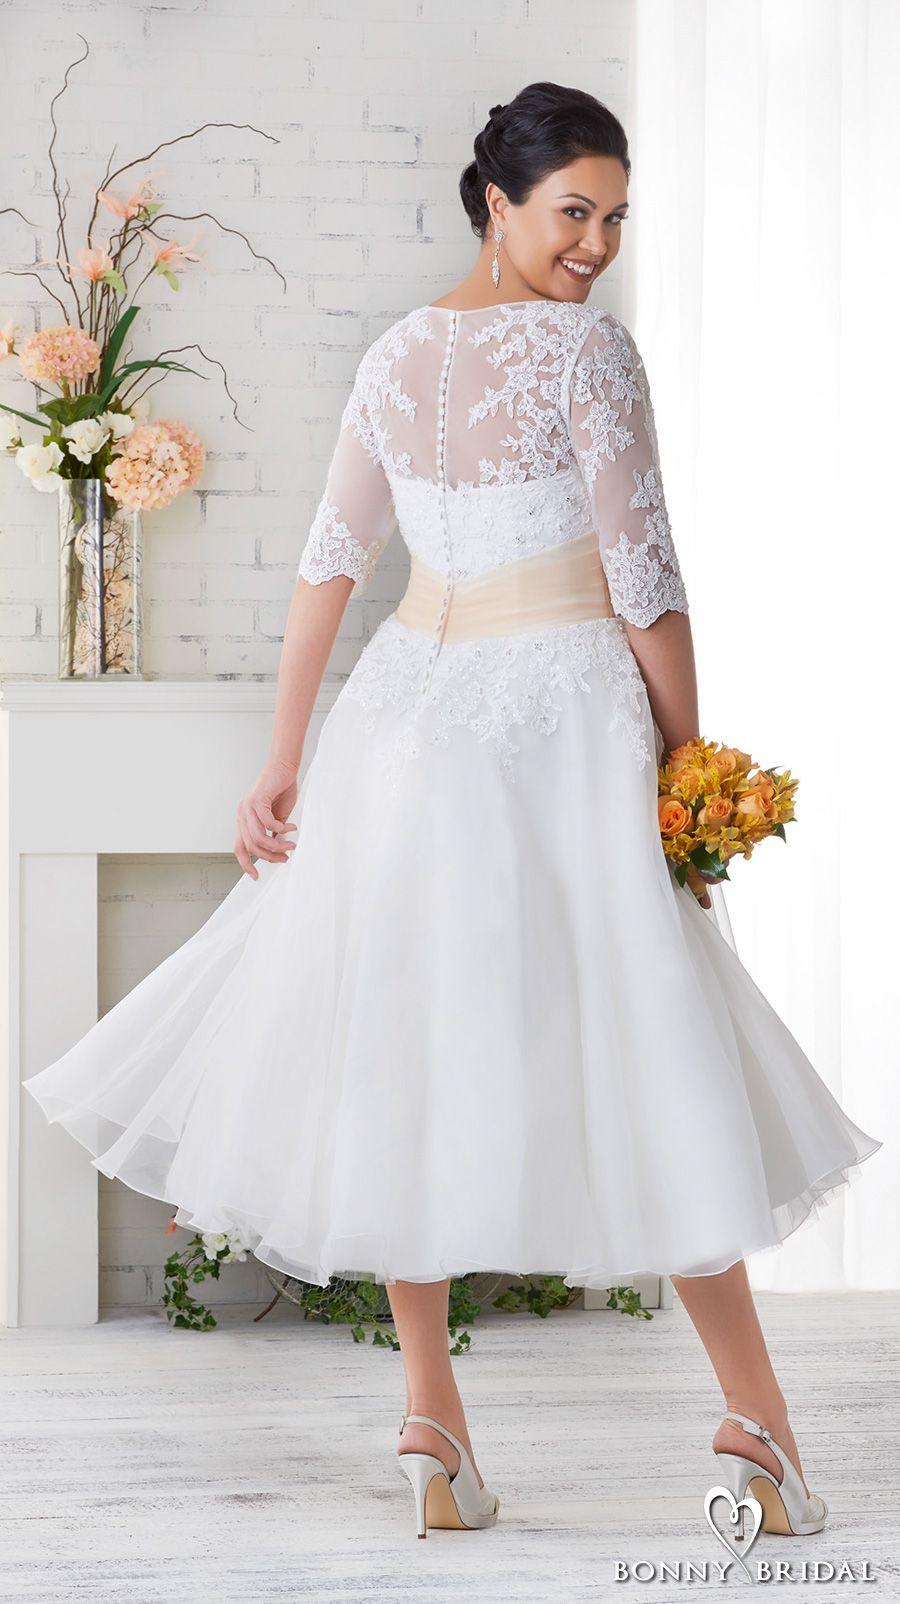 Bonny Bridal Wedding Dresses Unforgettable Styles For Every Bride Wedding Inspirasi Short Wedding Dress Plus Size Wedding Gowns Wedding Dress Organza [ 1604 x 900 Pixel ]